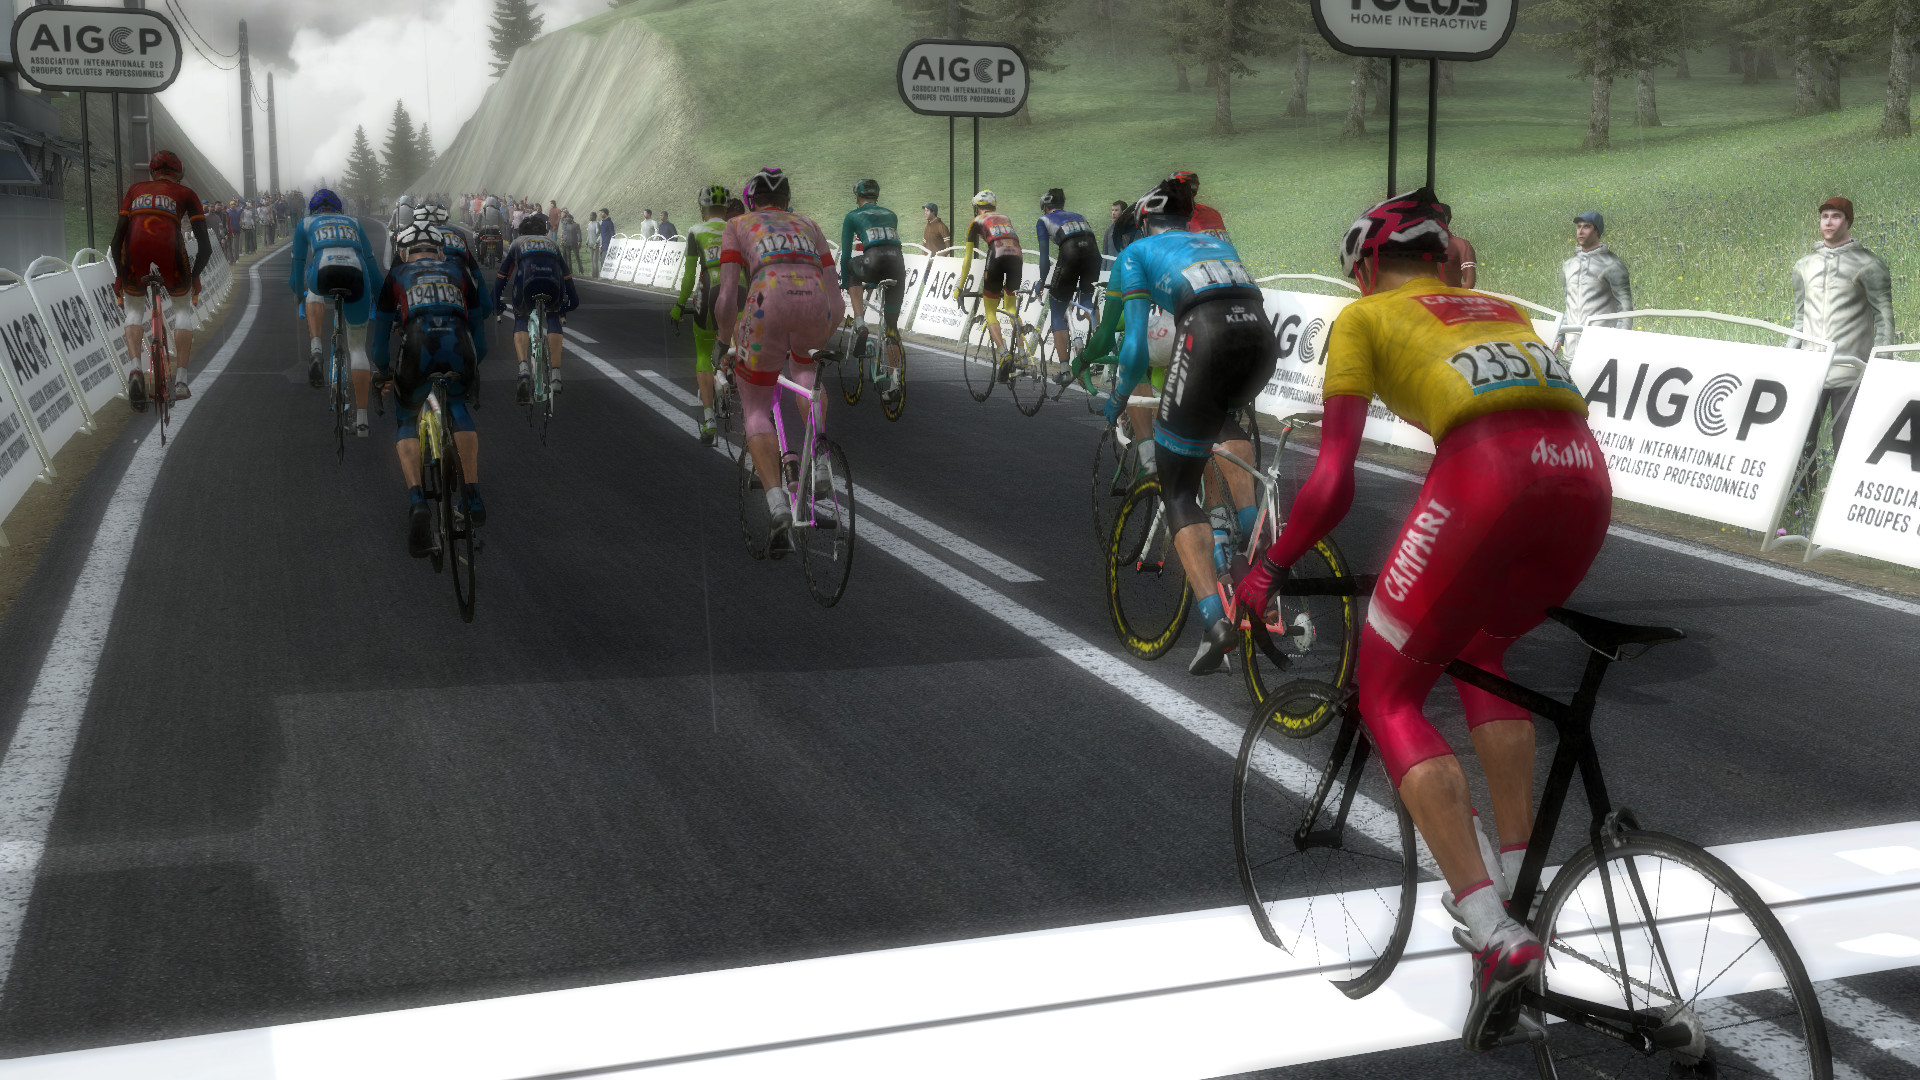 pcmdaily.com/images/mg/2019/Races/PTHC/Pologne/E5/29.jpg